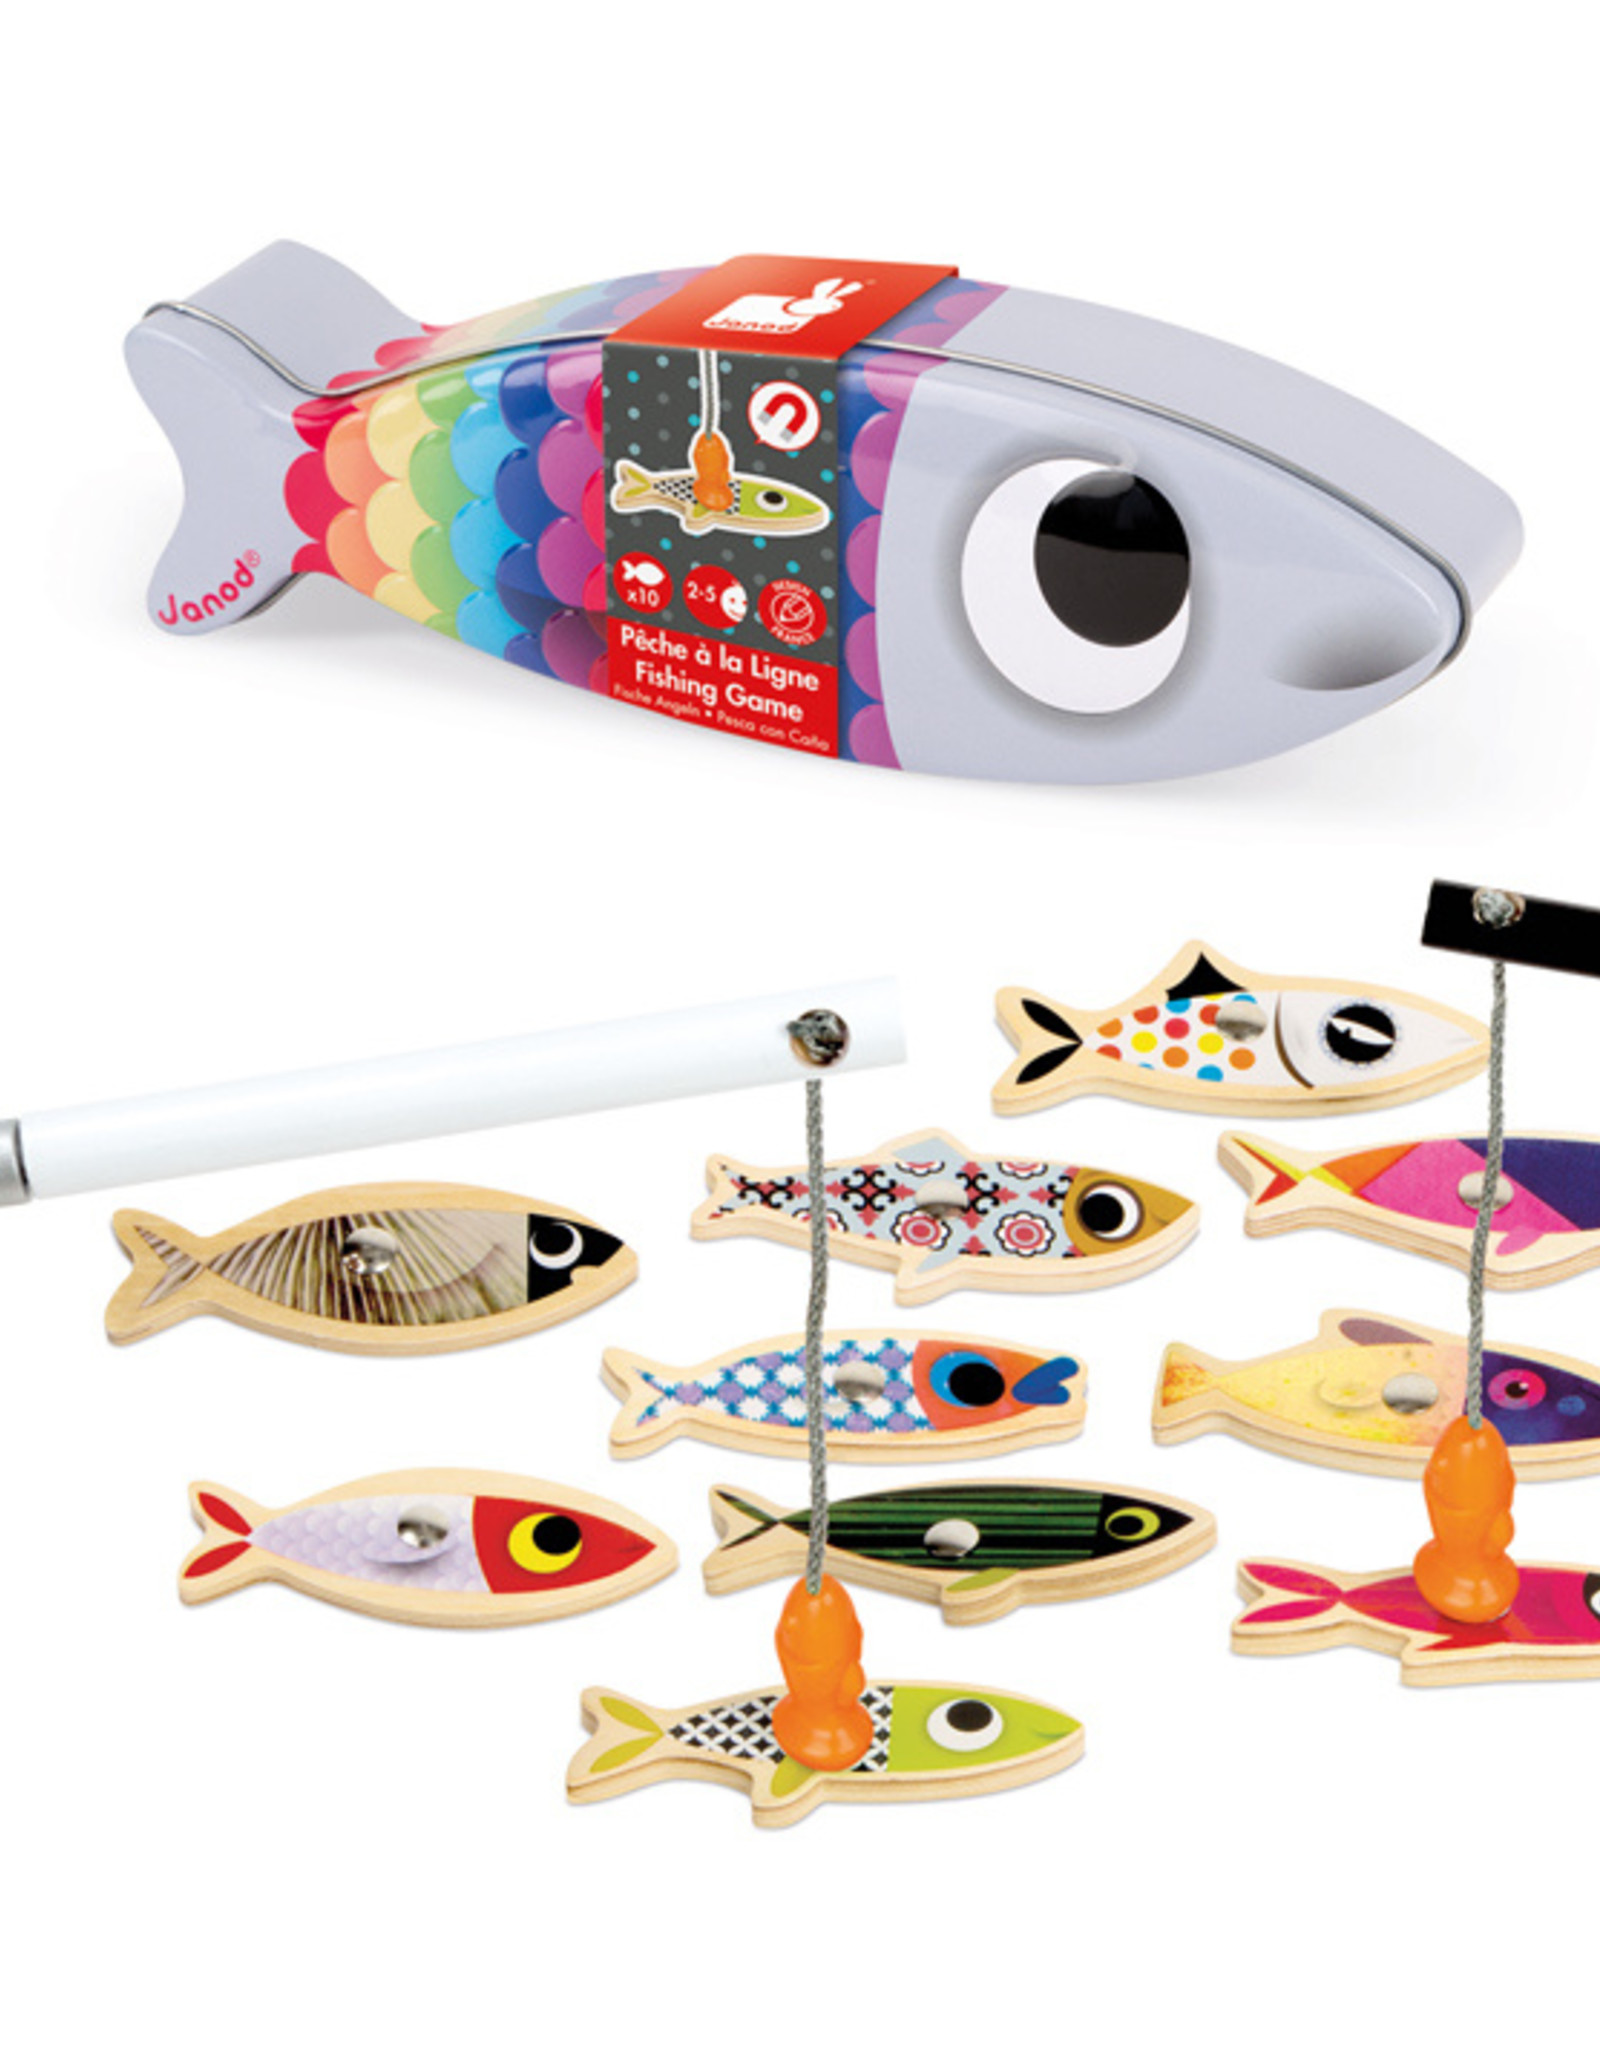 Janod Janod - Sardine Fishing Game